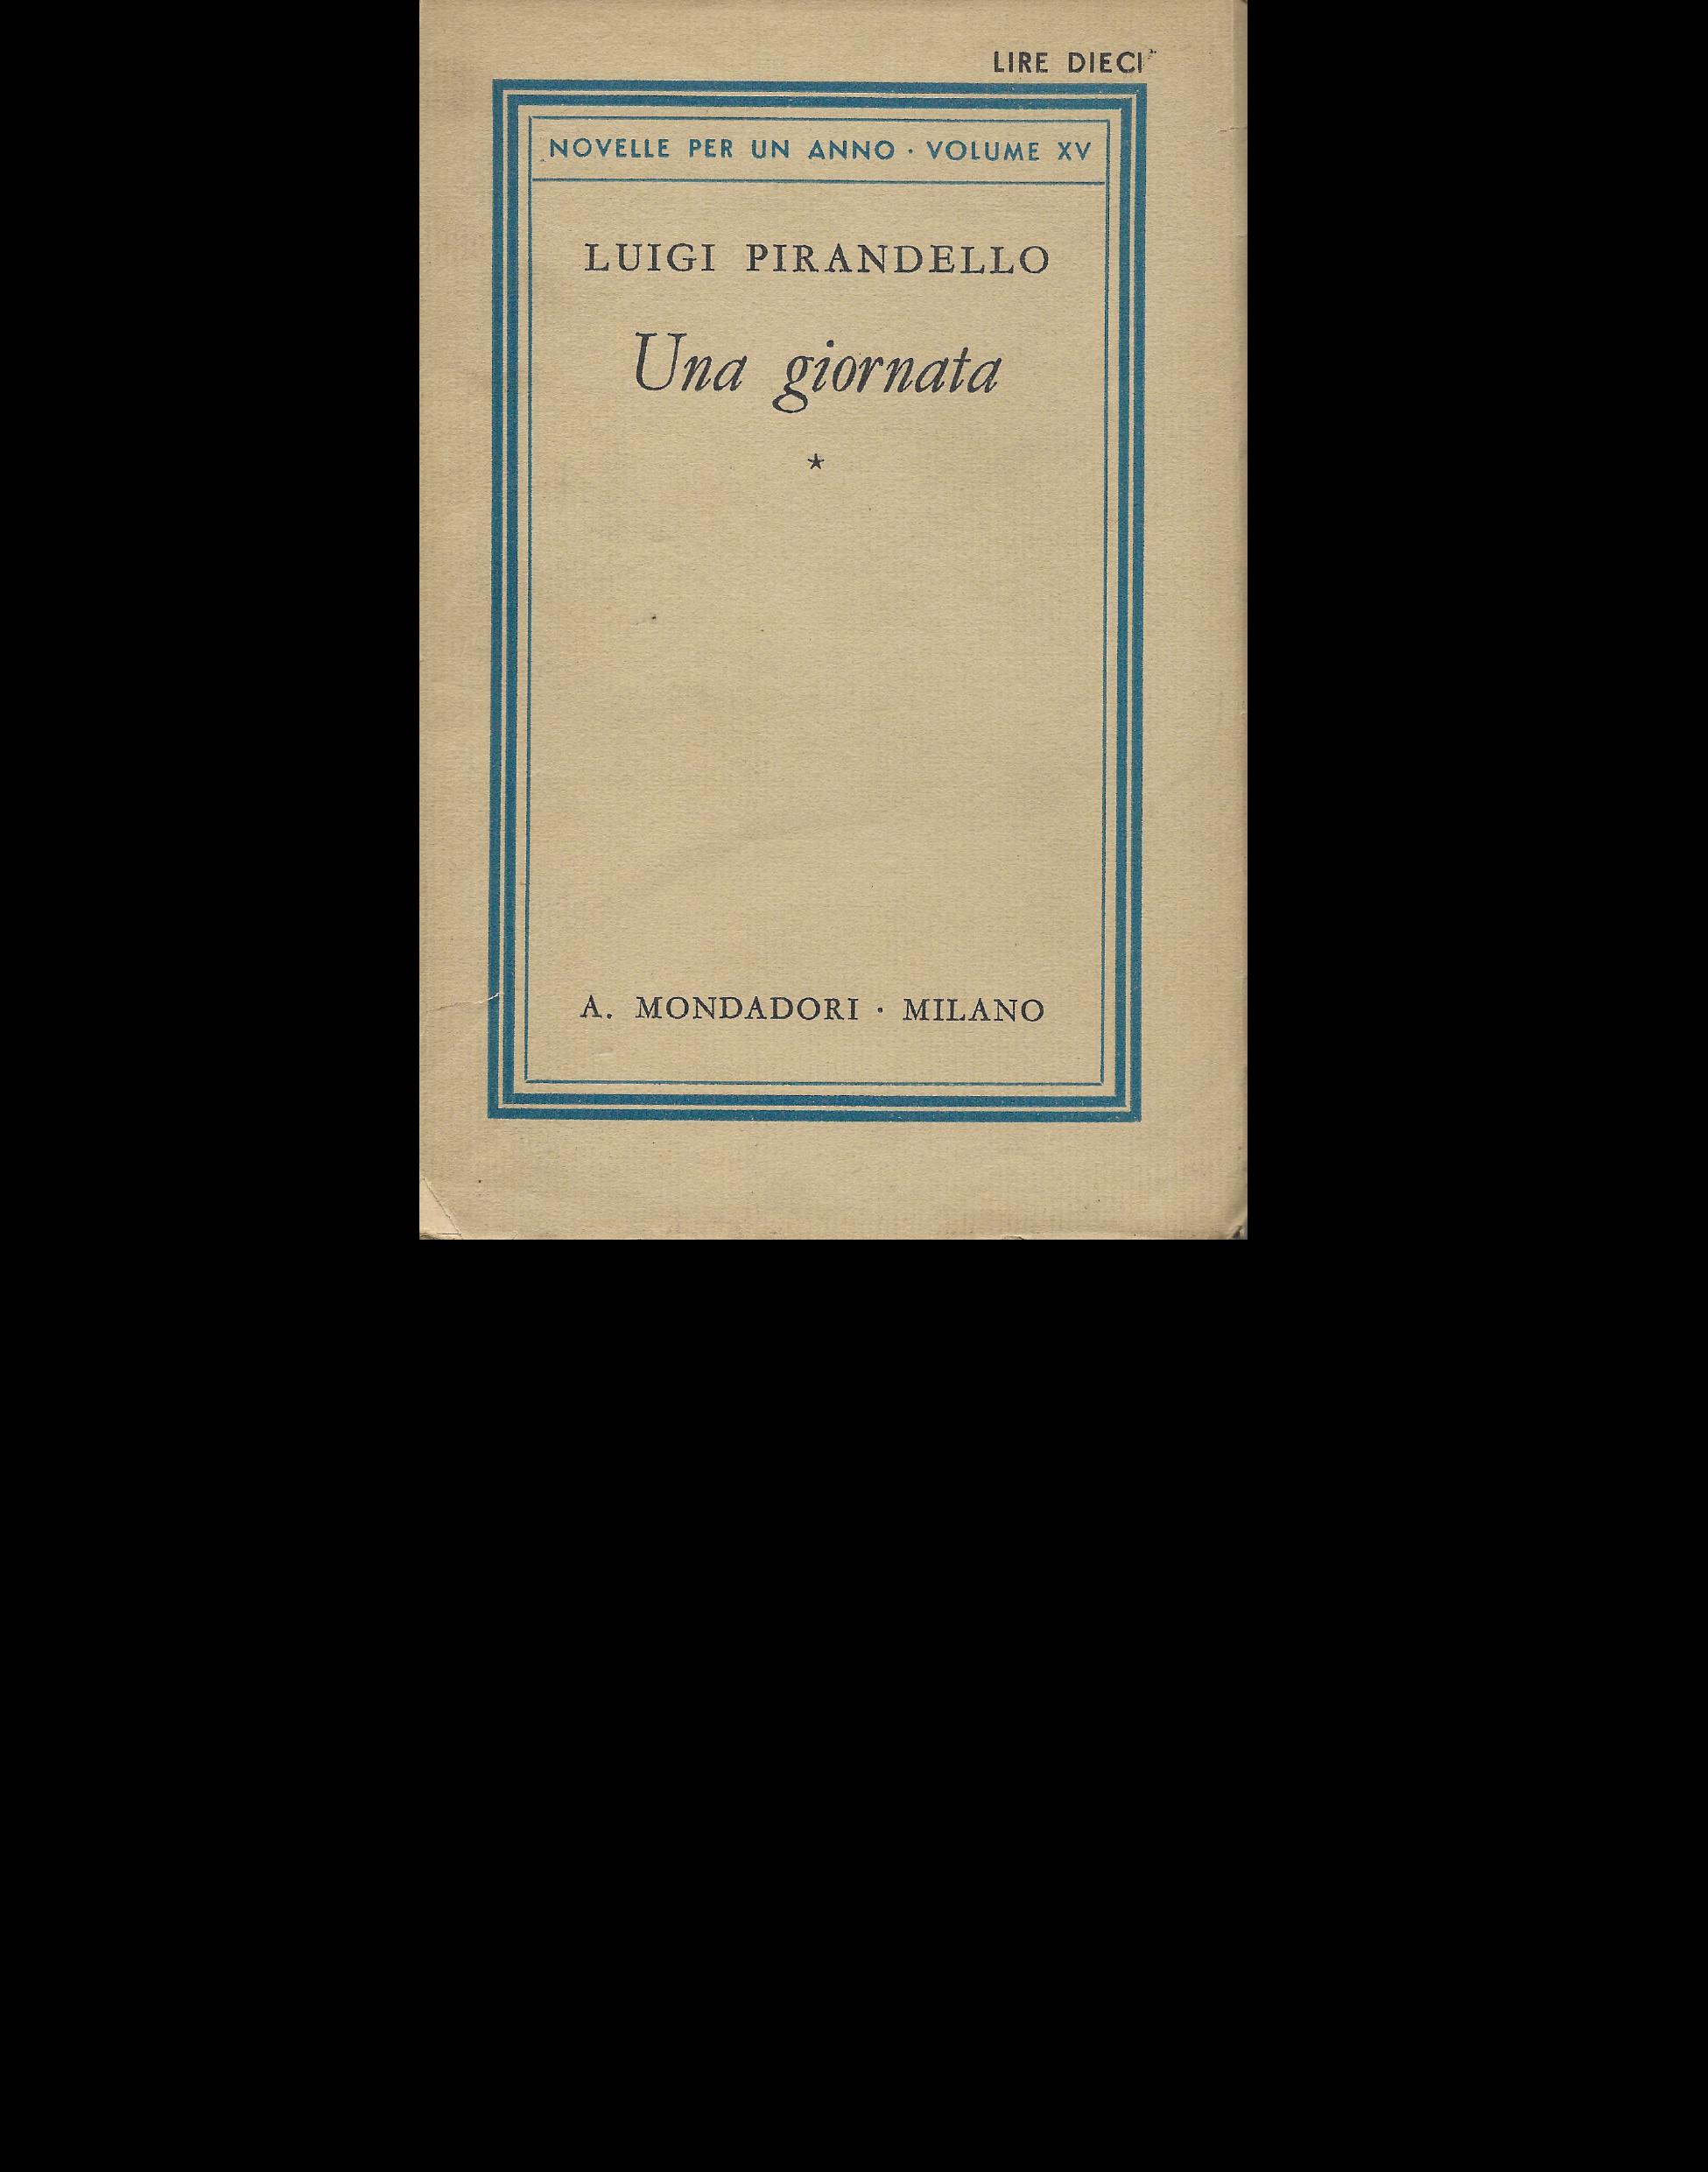 UNA GIORNATA[14698]